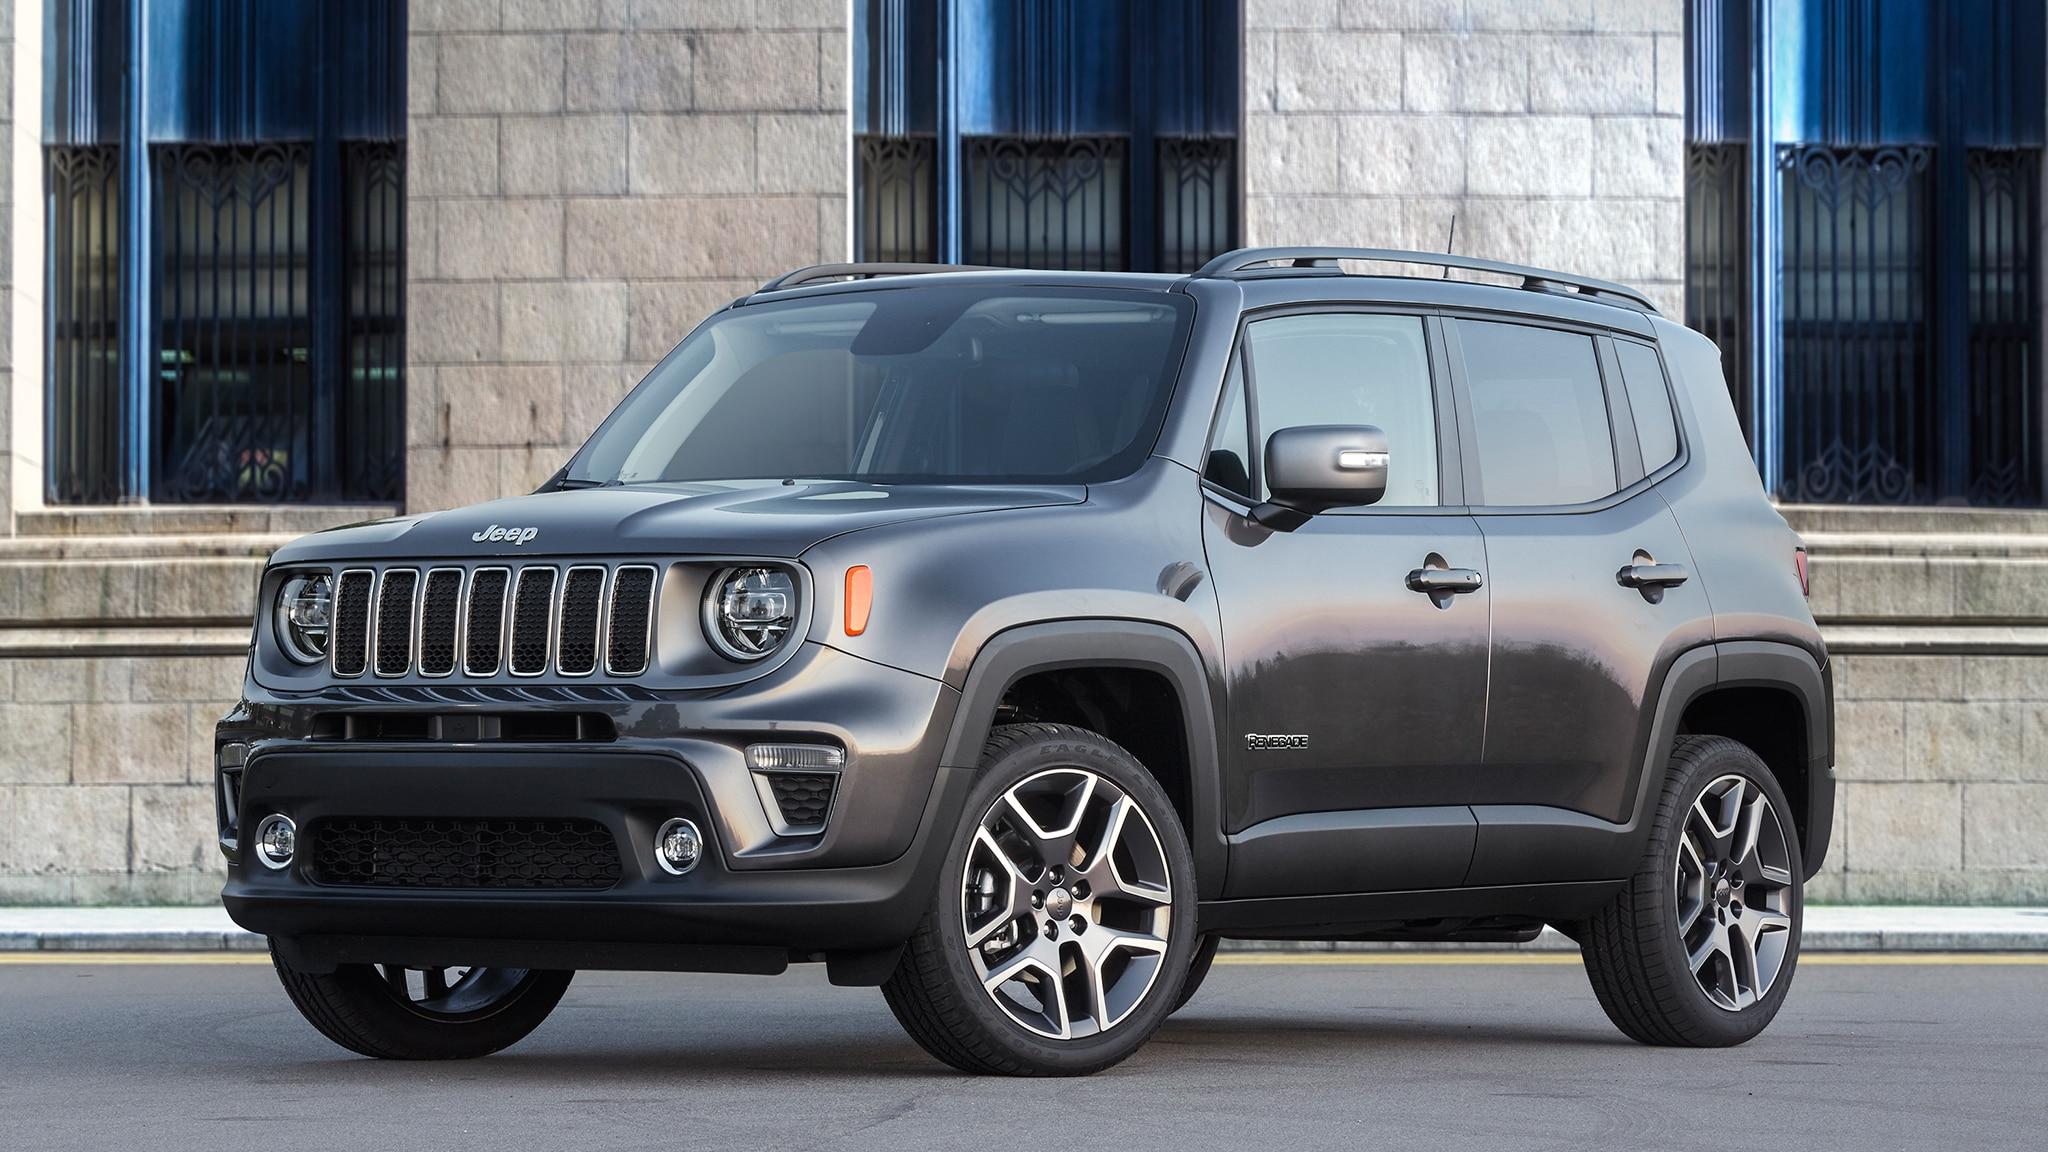 2019 Jeep Renegade Front Three Quarter